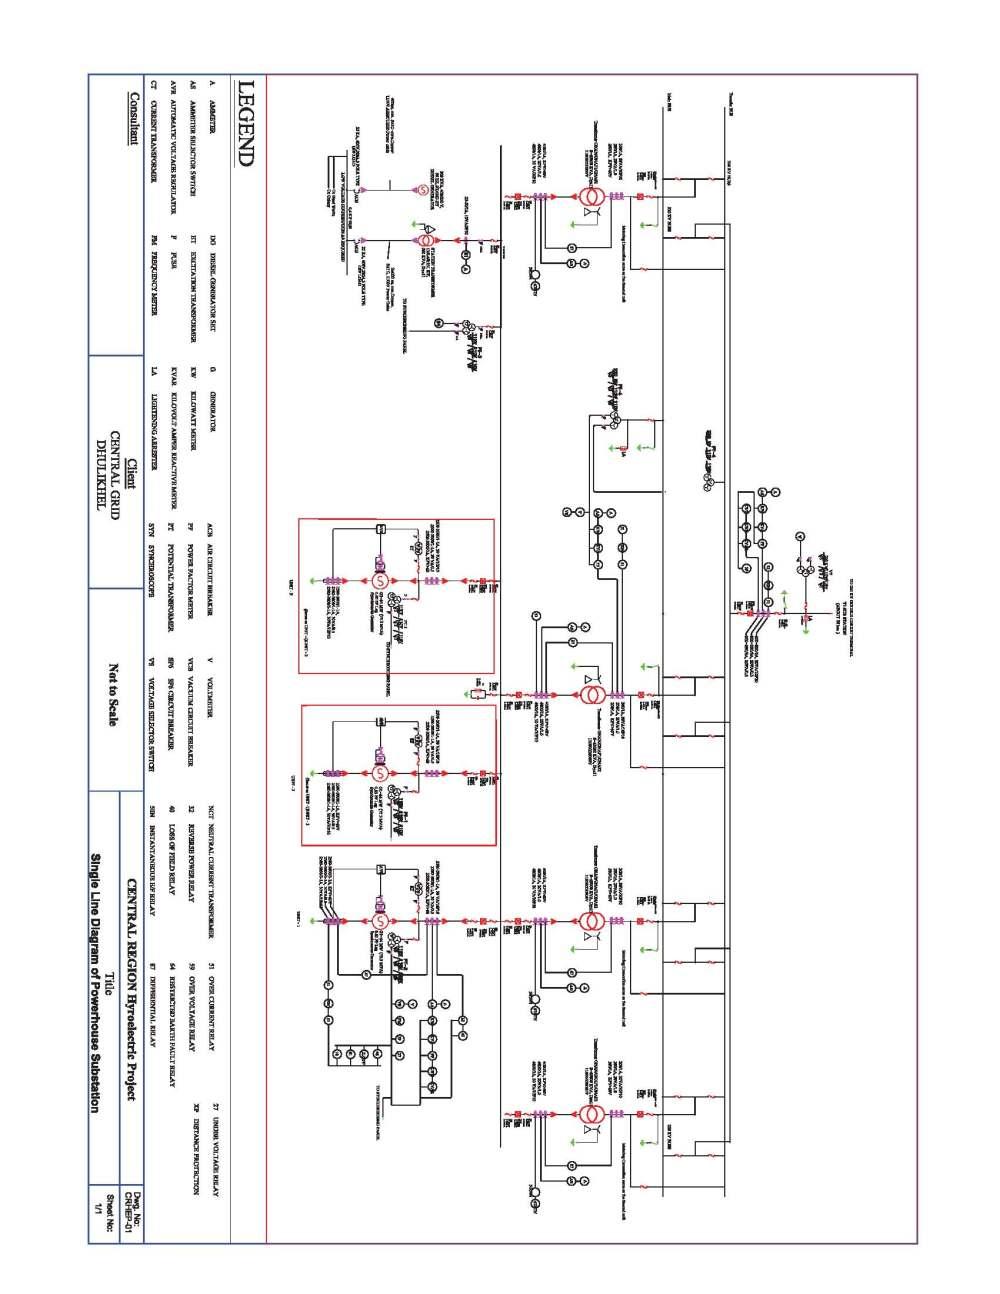 medium resolution of power plant one line diagram wiring diagram compilation thermal power plant single line diagram power evacuation